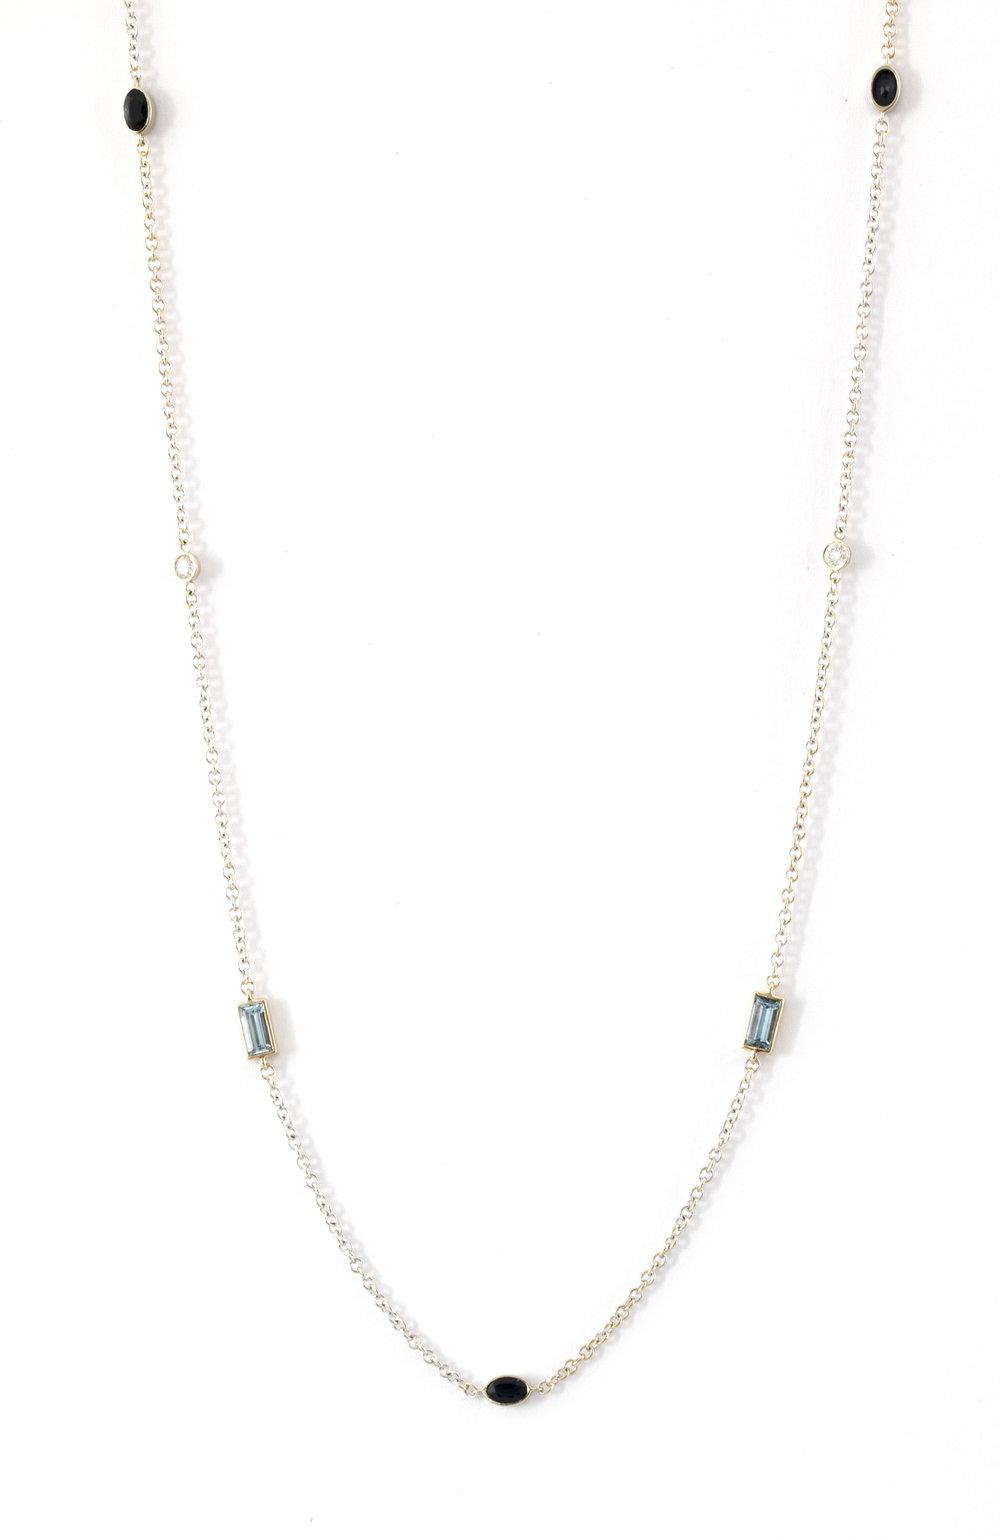 Aquamarine & Blue Sapphire Necklace